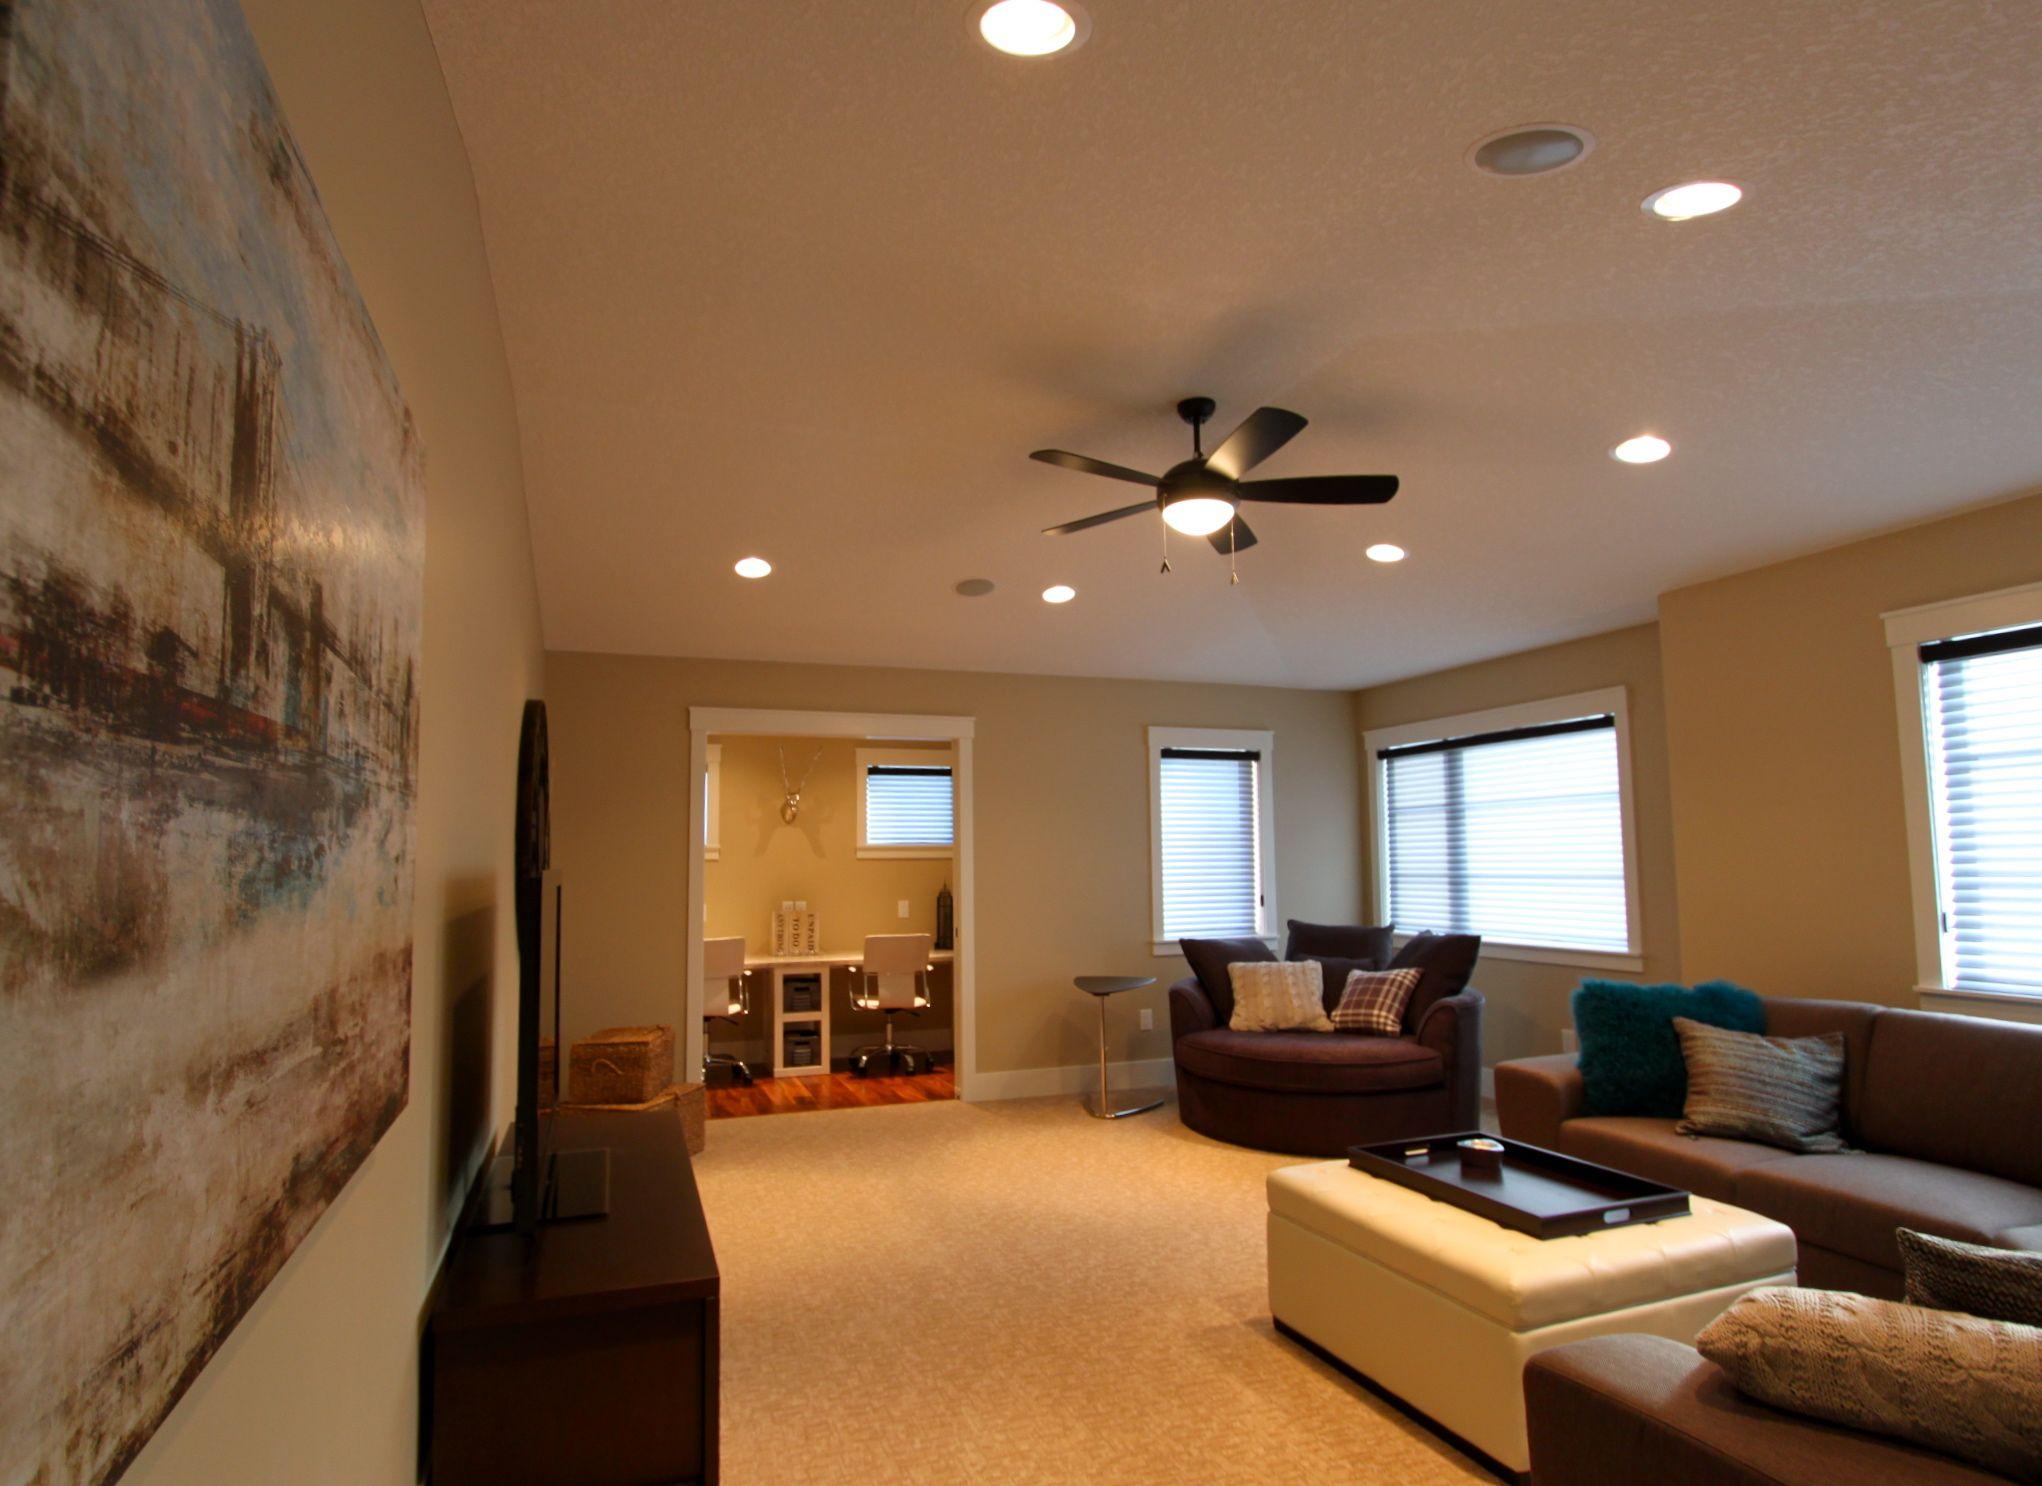 Slanted Ceiling Bedroom Ideas